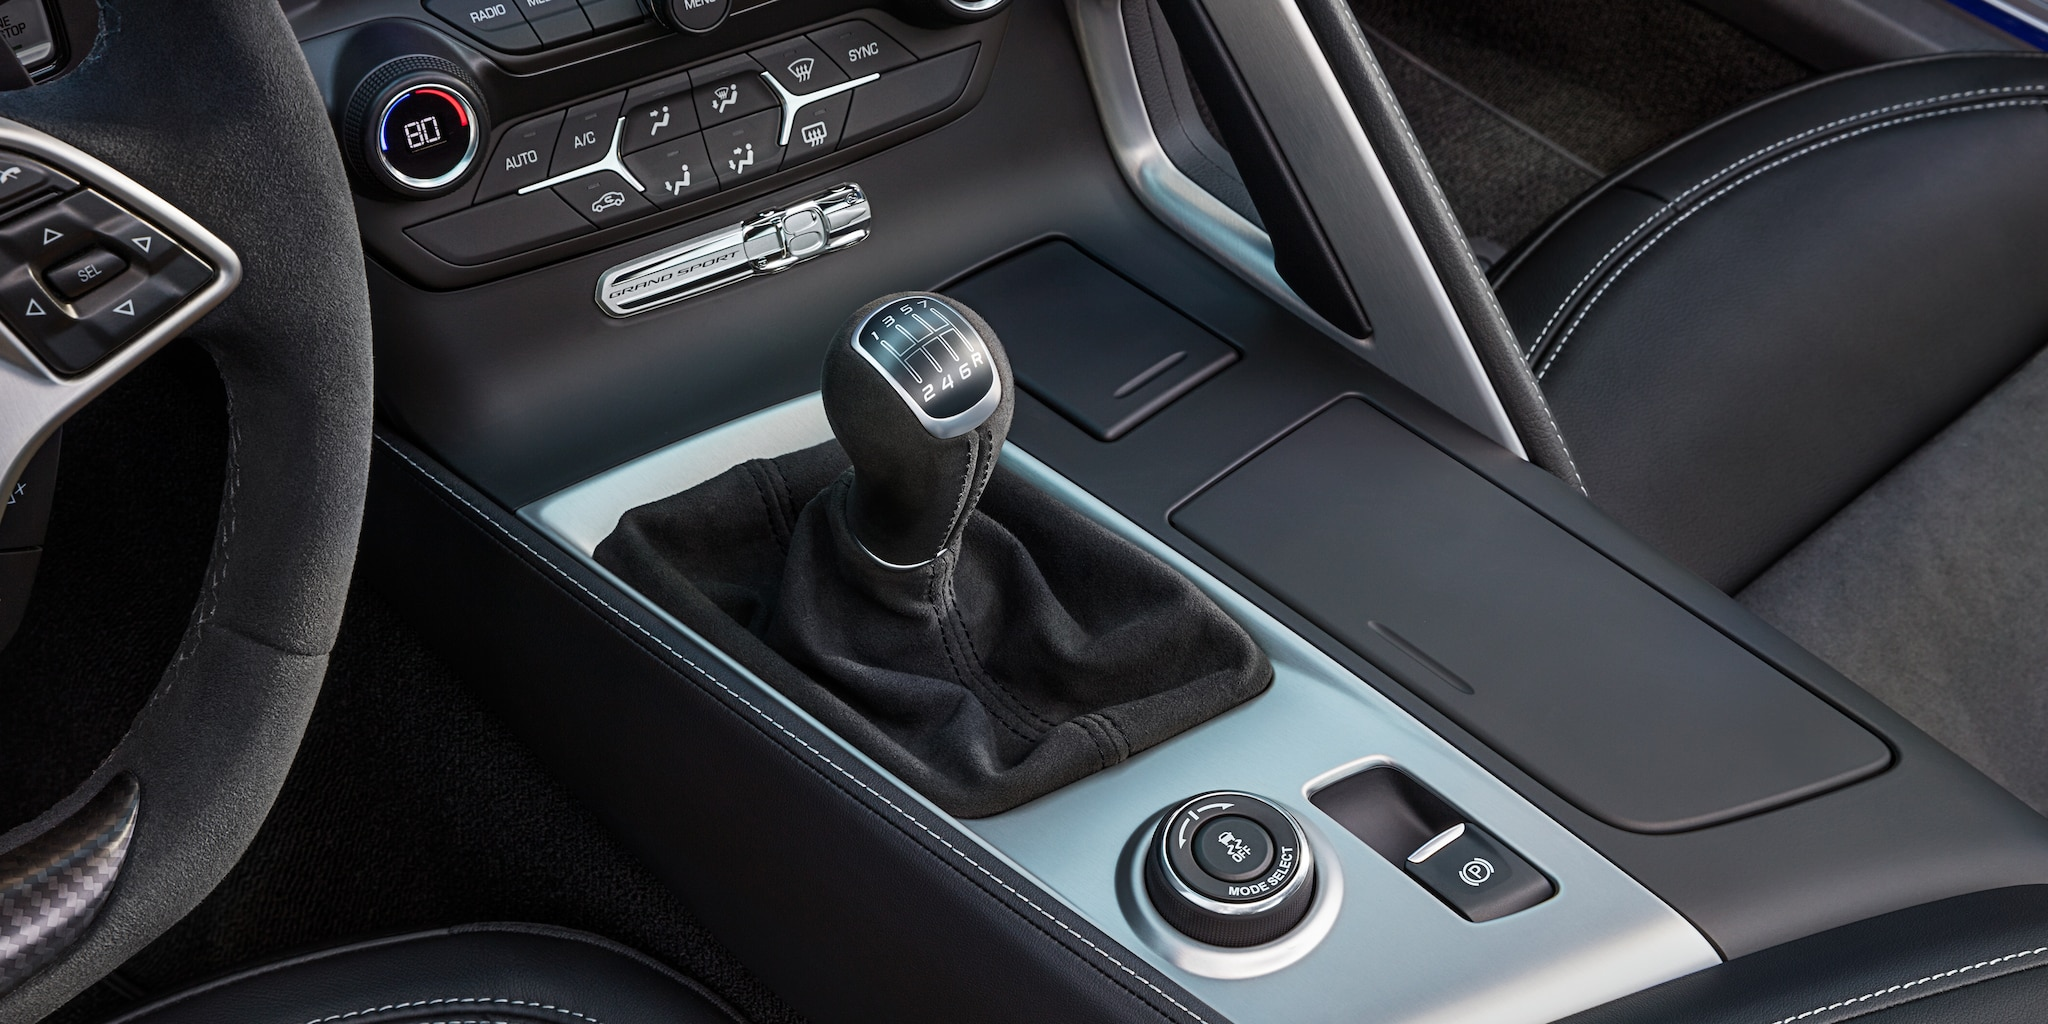 Diseño del auto deportivo Corvette Grand Sport 2019: palanca de cambios